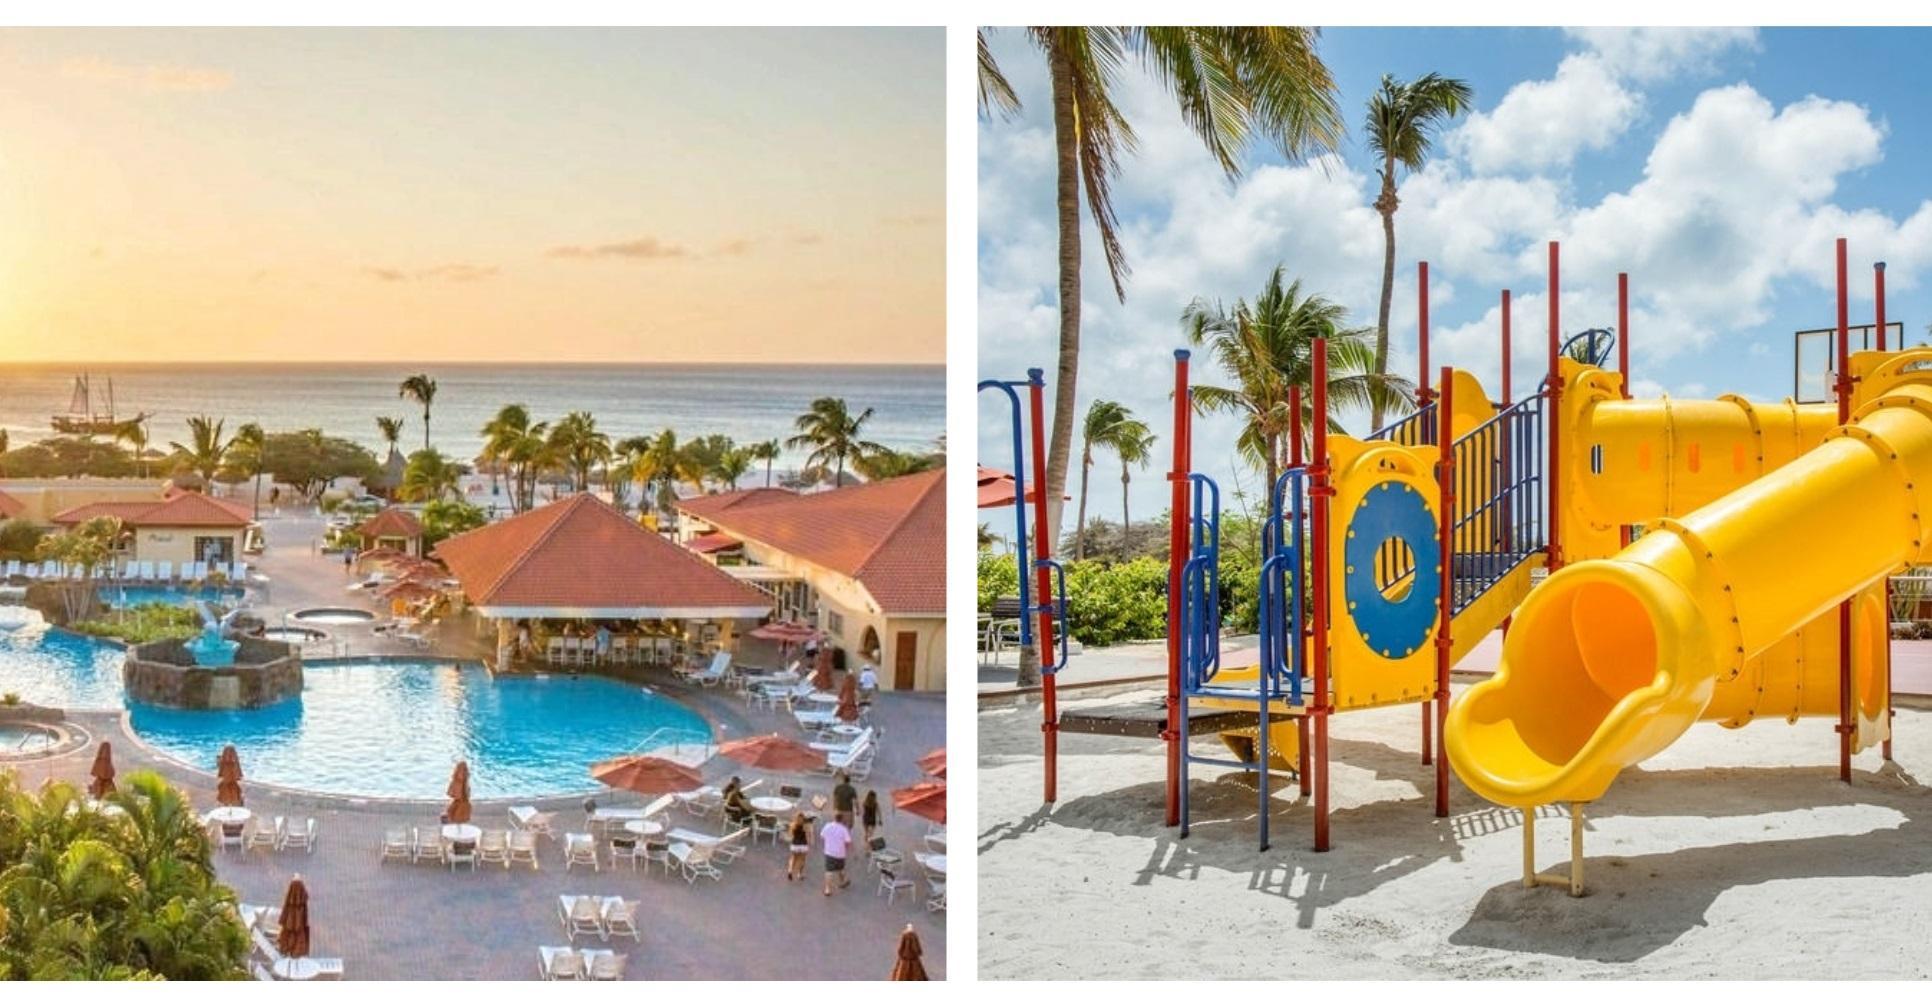 Aruba Destination Weddings | La Cabana Beach Resort family friendly vacation resort | Beach Brides aruba wedding blog